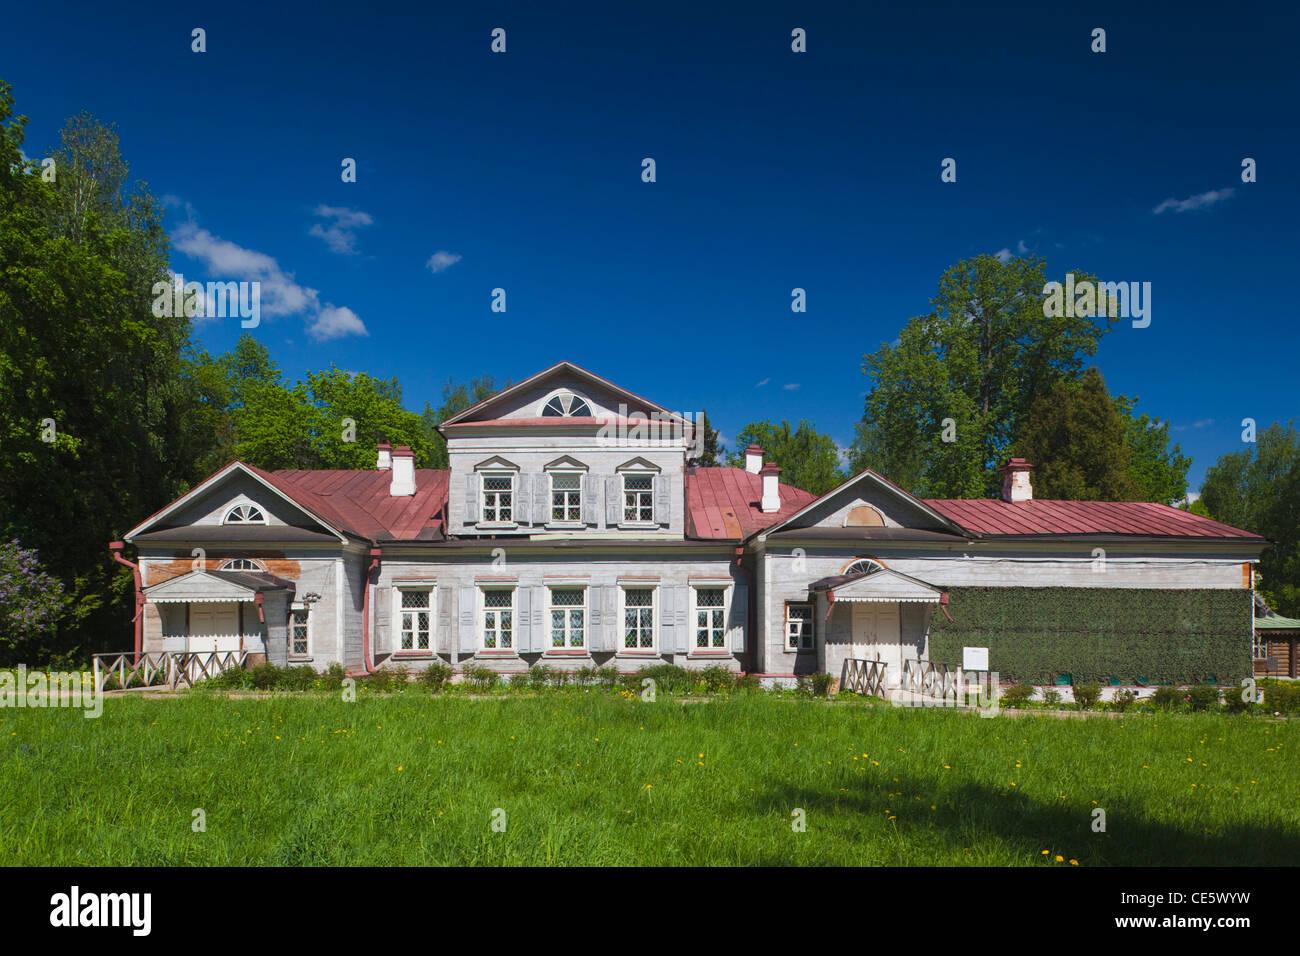 Russia, Moscow Oblast, Abramtsevo, Abramtsevo Estate Museum-Preserve, former estate of railway tycoon Savva Mamontov. - Stock Image